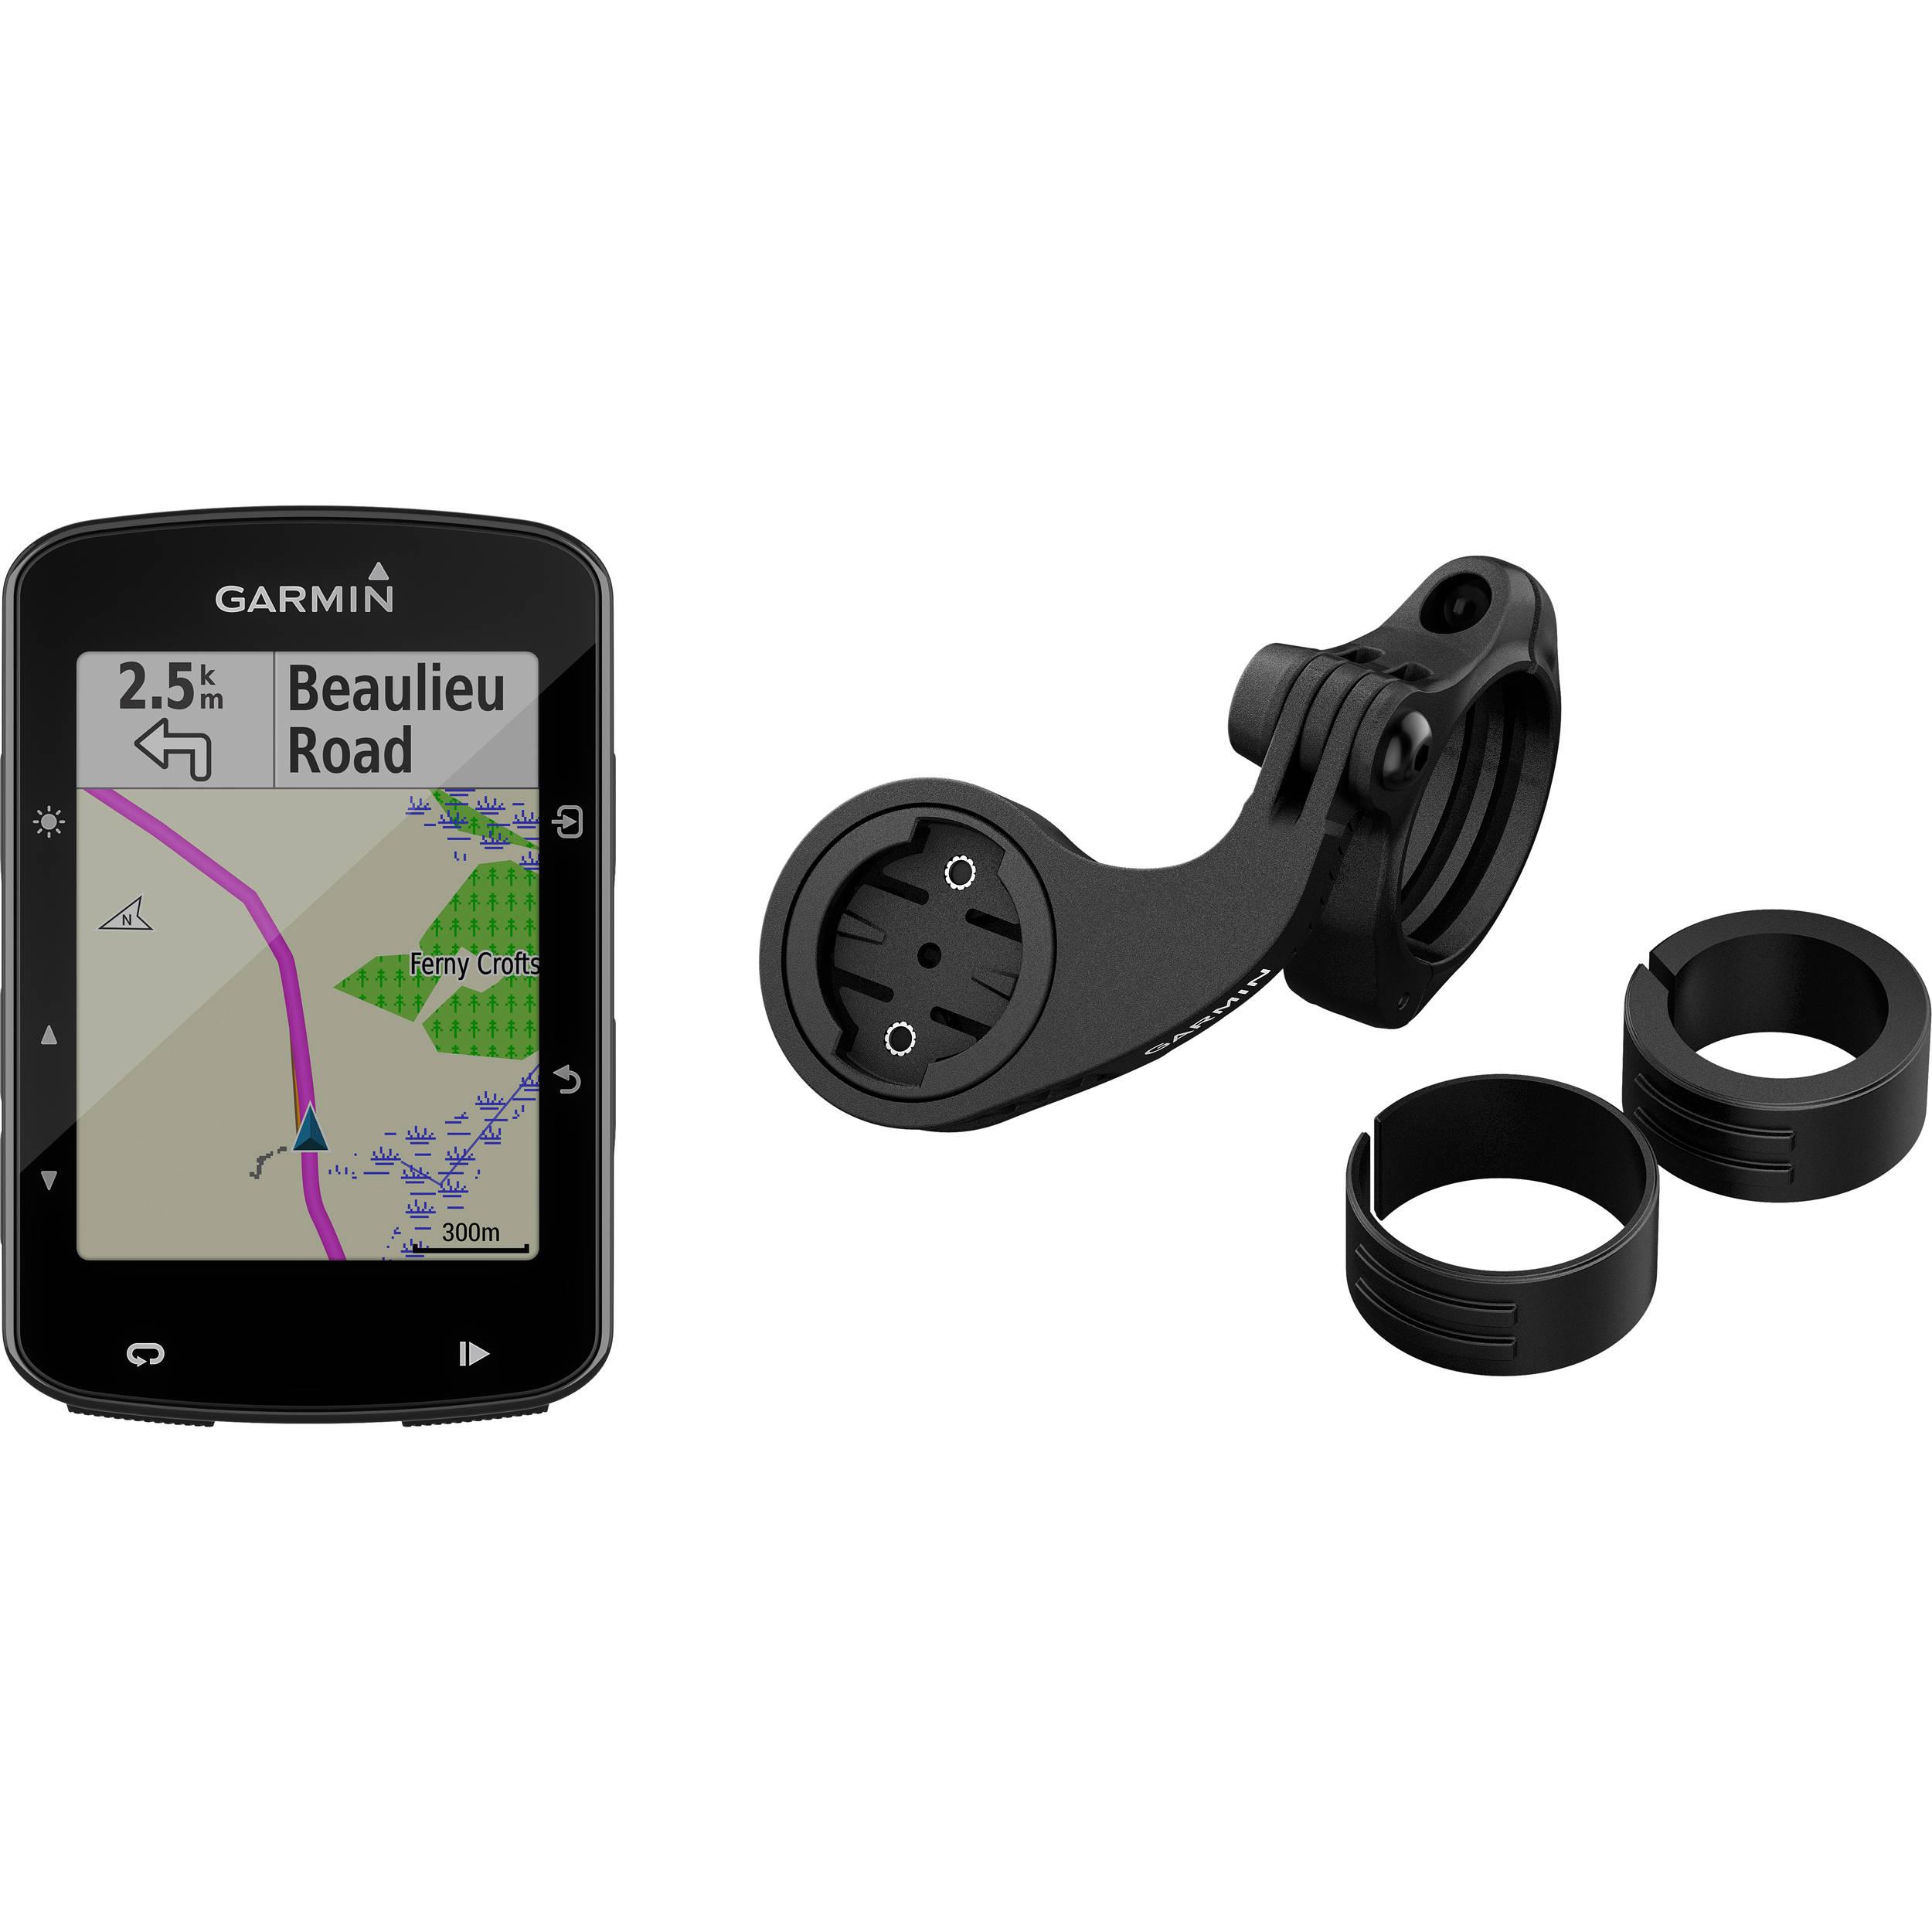 f5c77bbcff5 Garmin Edge 520 Plus GPS/GLONASS Cycling Computer Mountain Bike Bundle